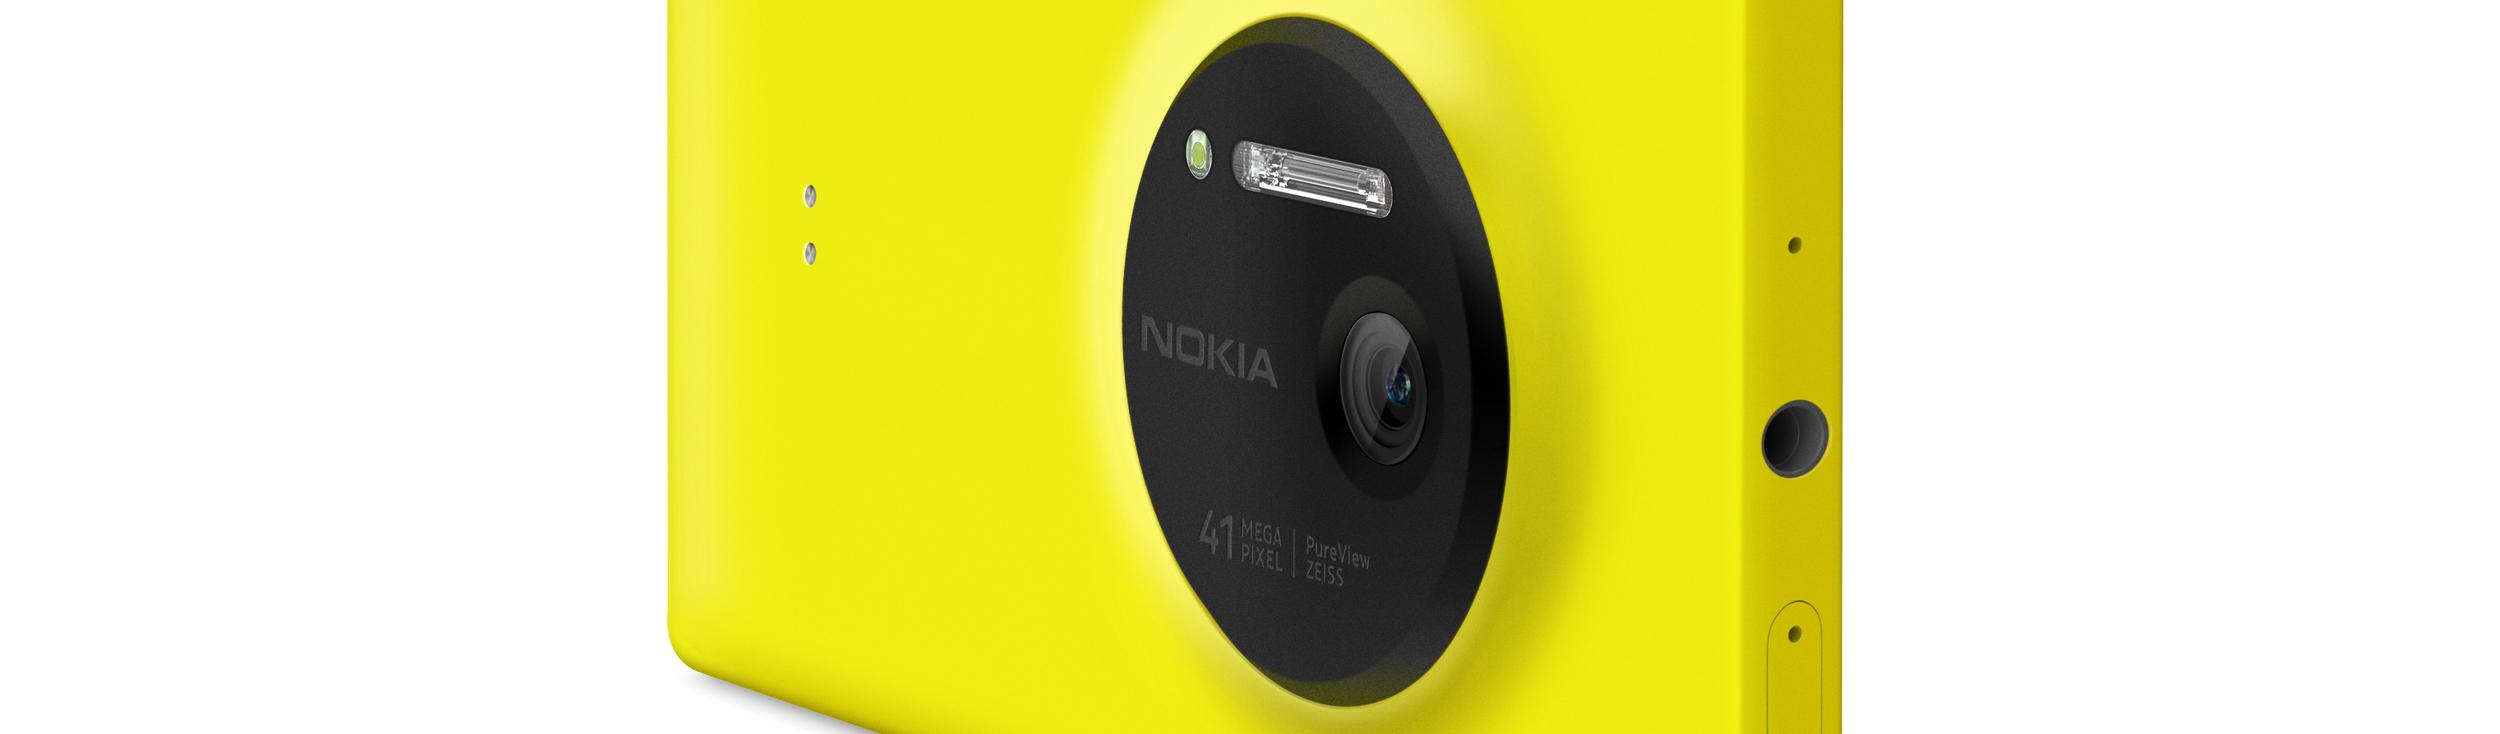 nokia-lumia-1020_back.jpg